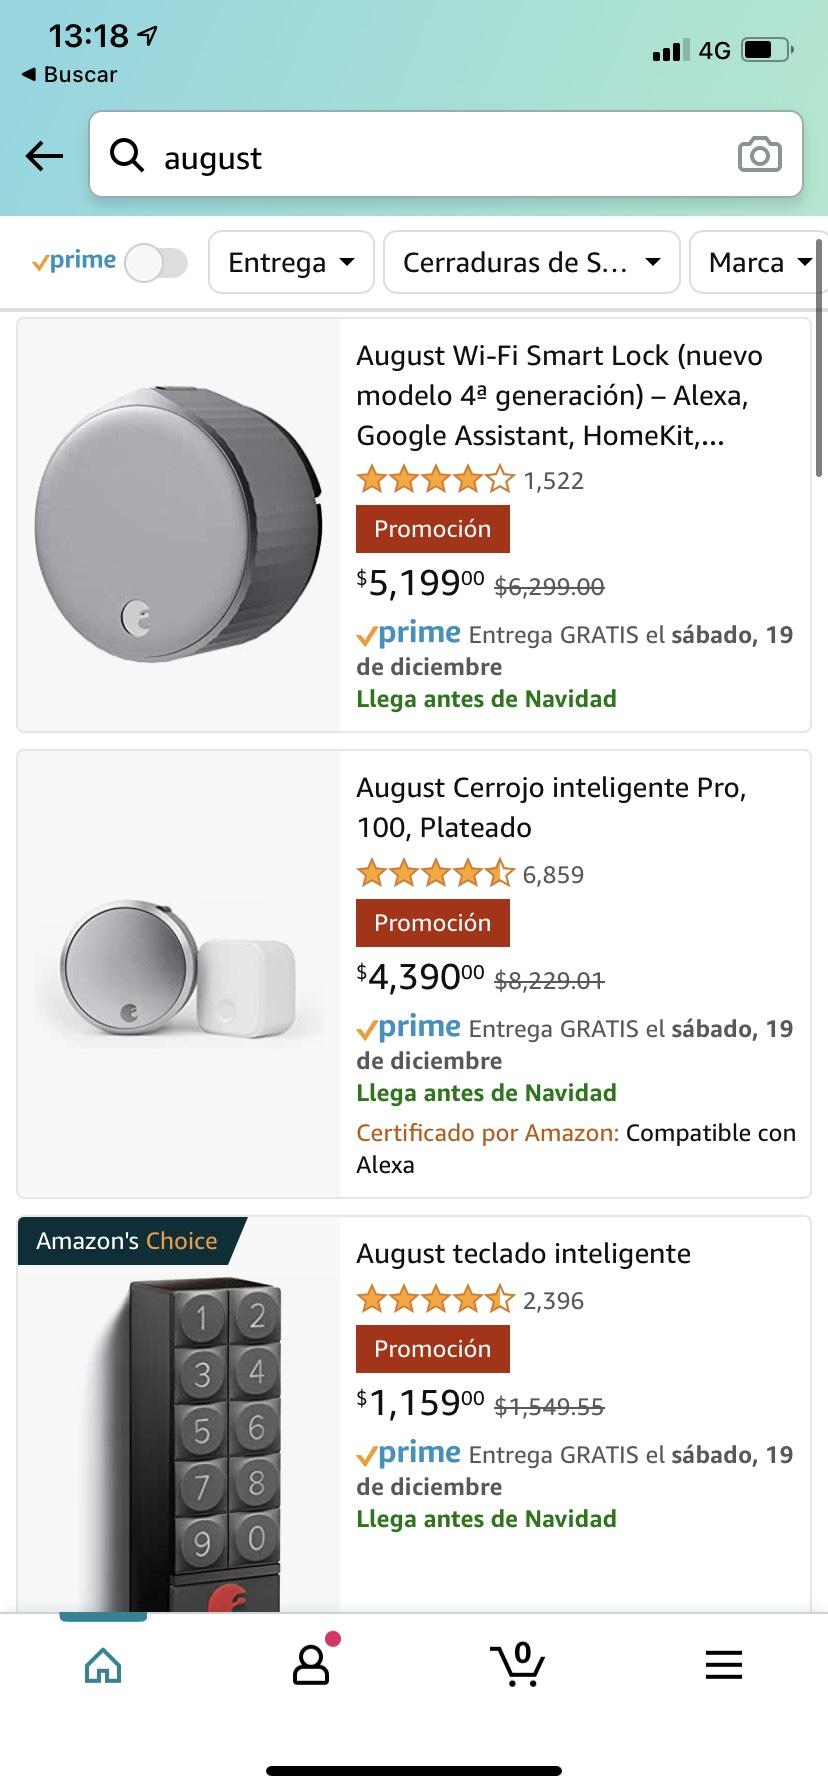 Amazon: August wifi smart lock